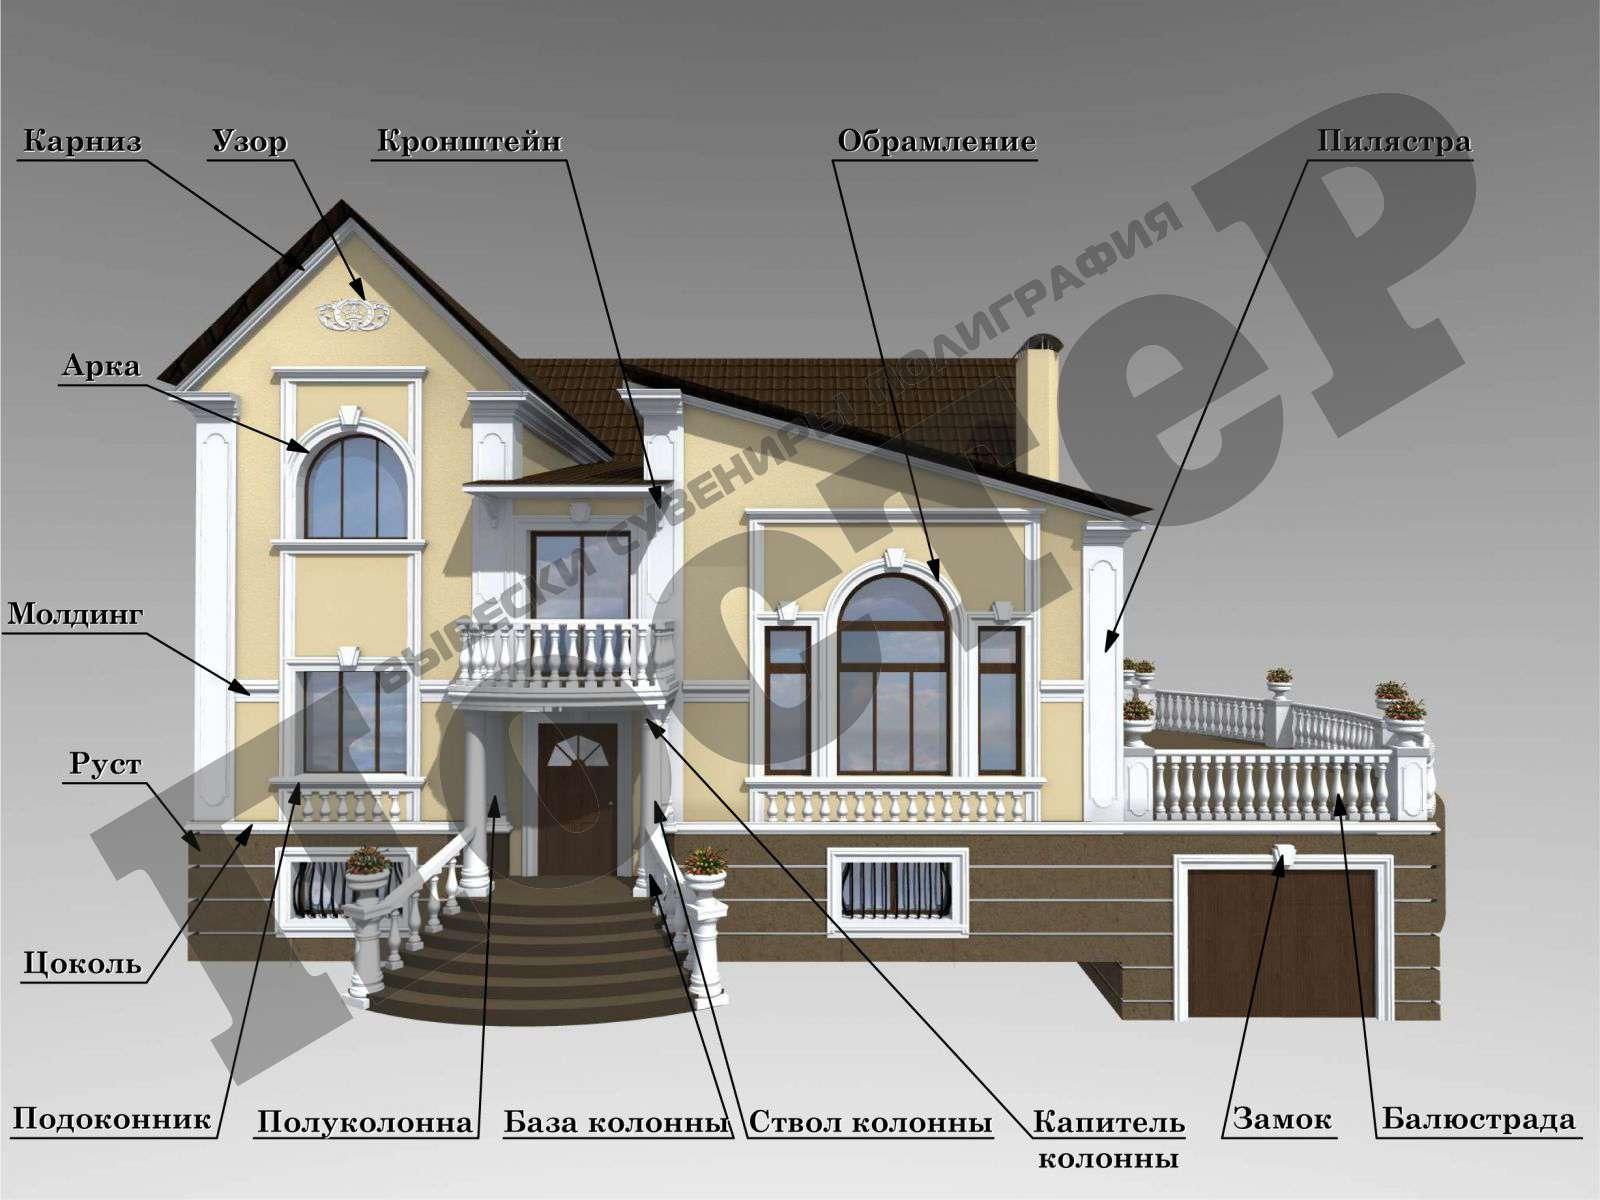 Основные элементы фасада